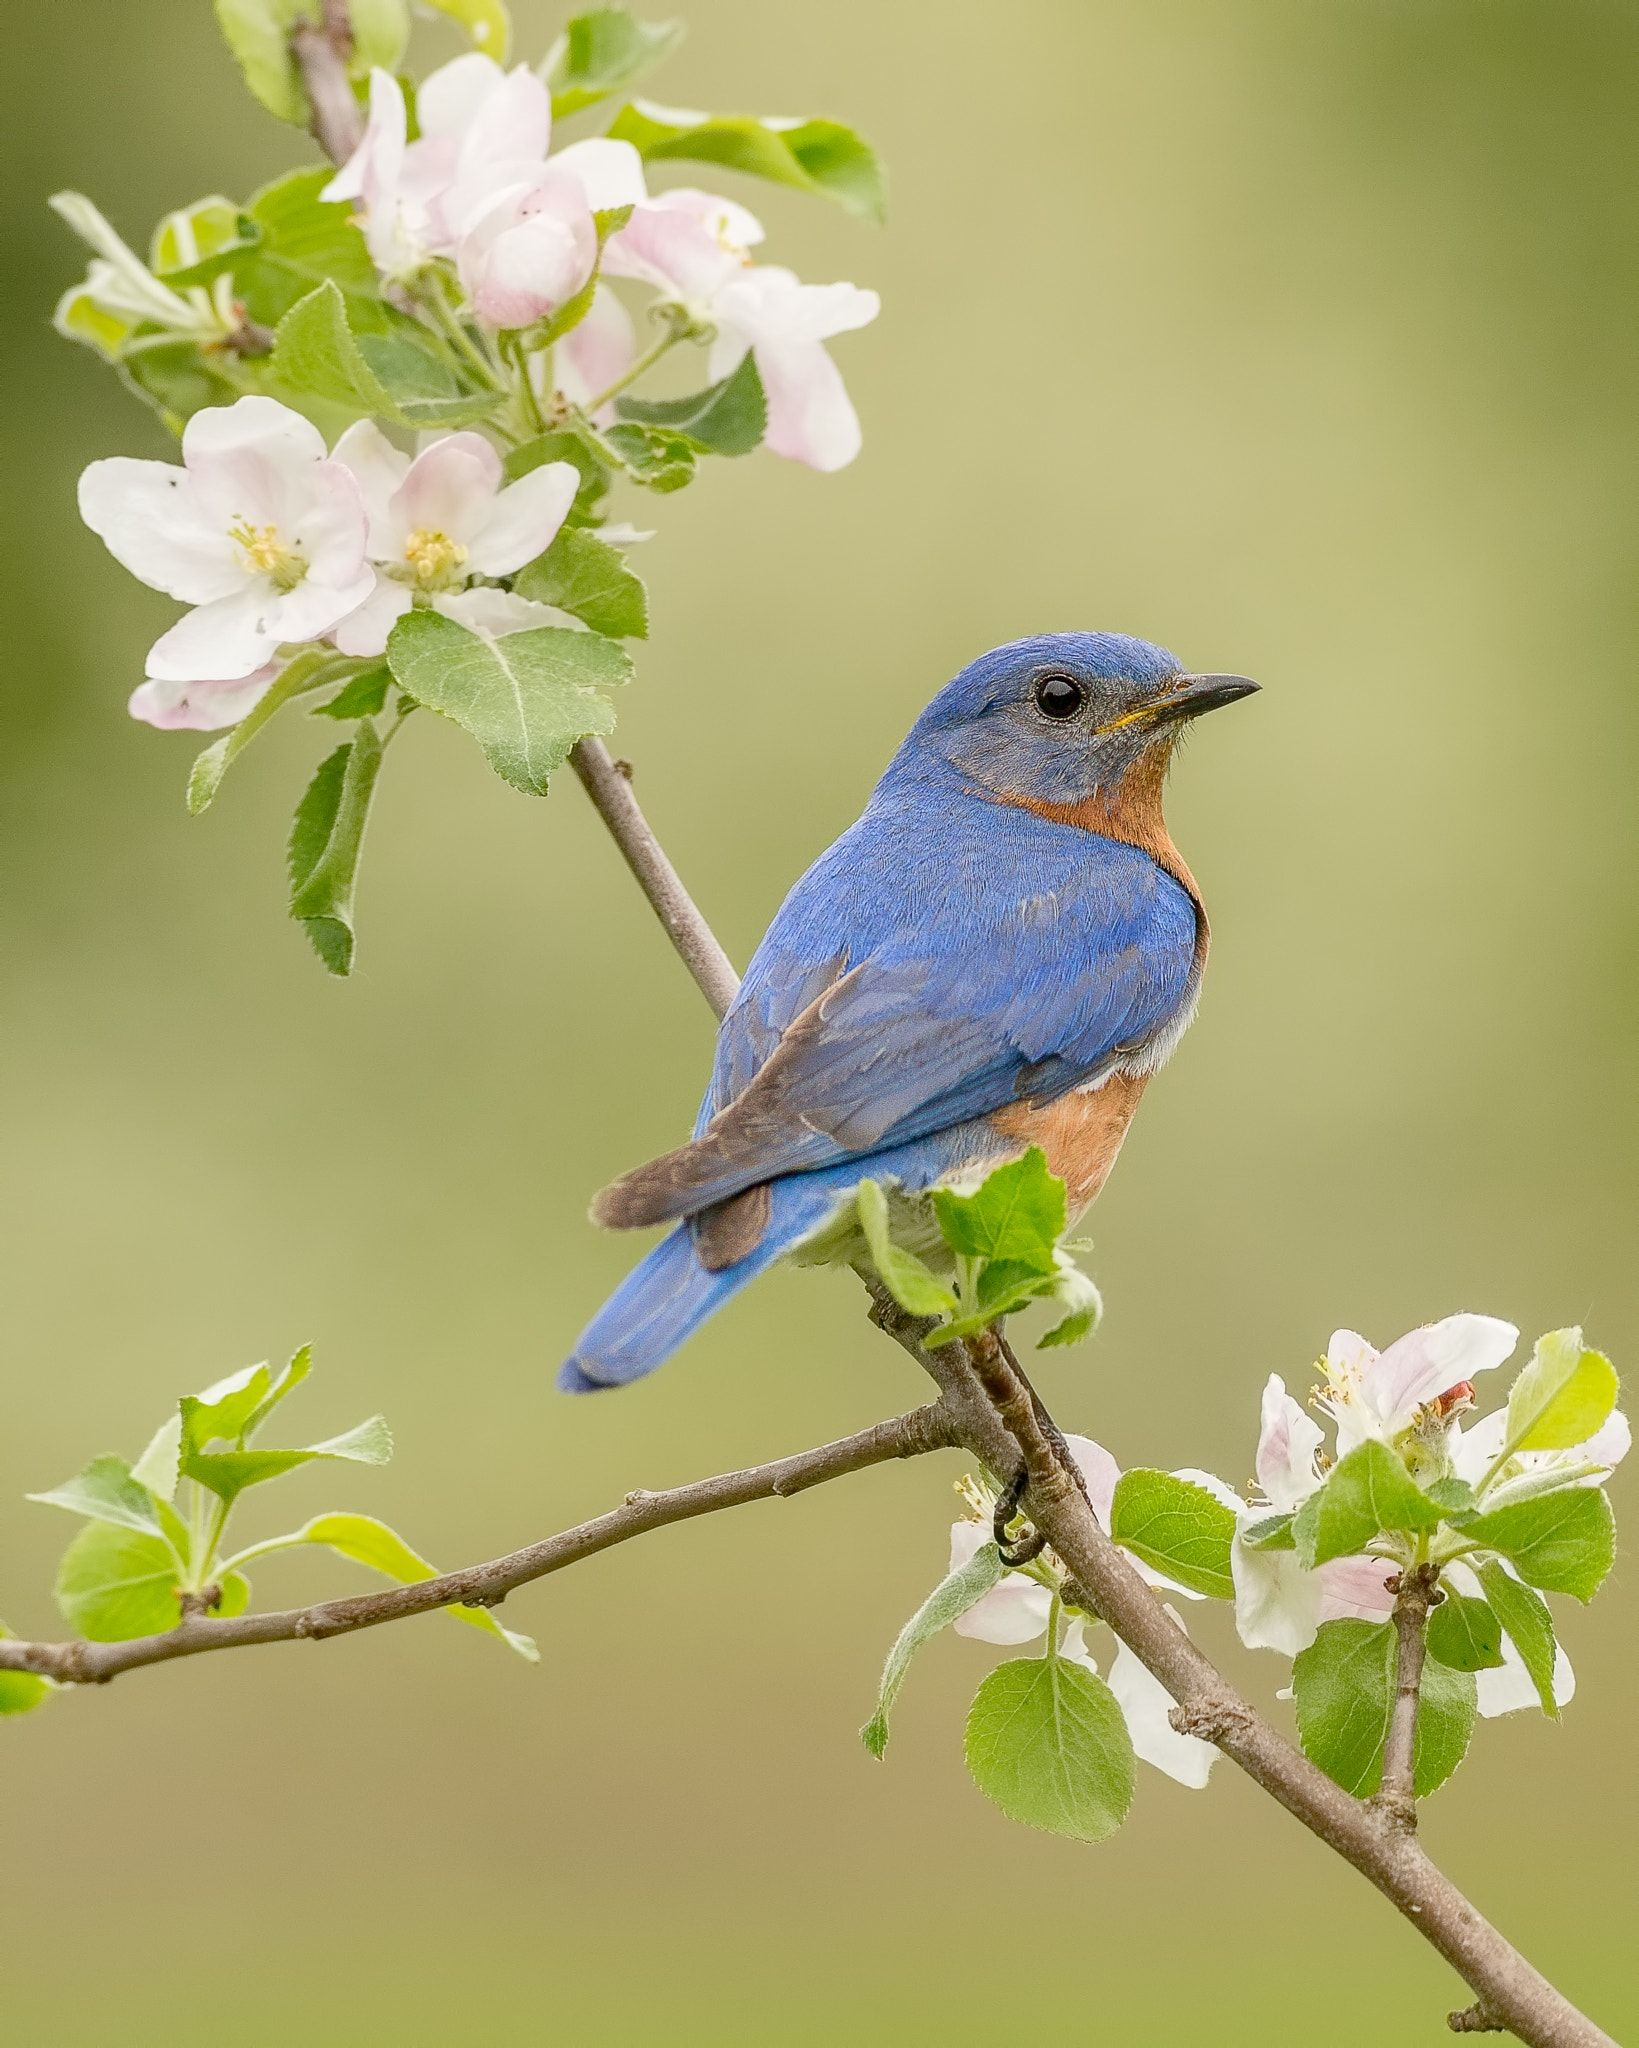 Bluebird and apple blossoms a male eastern bluebird